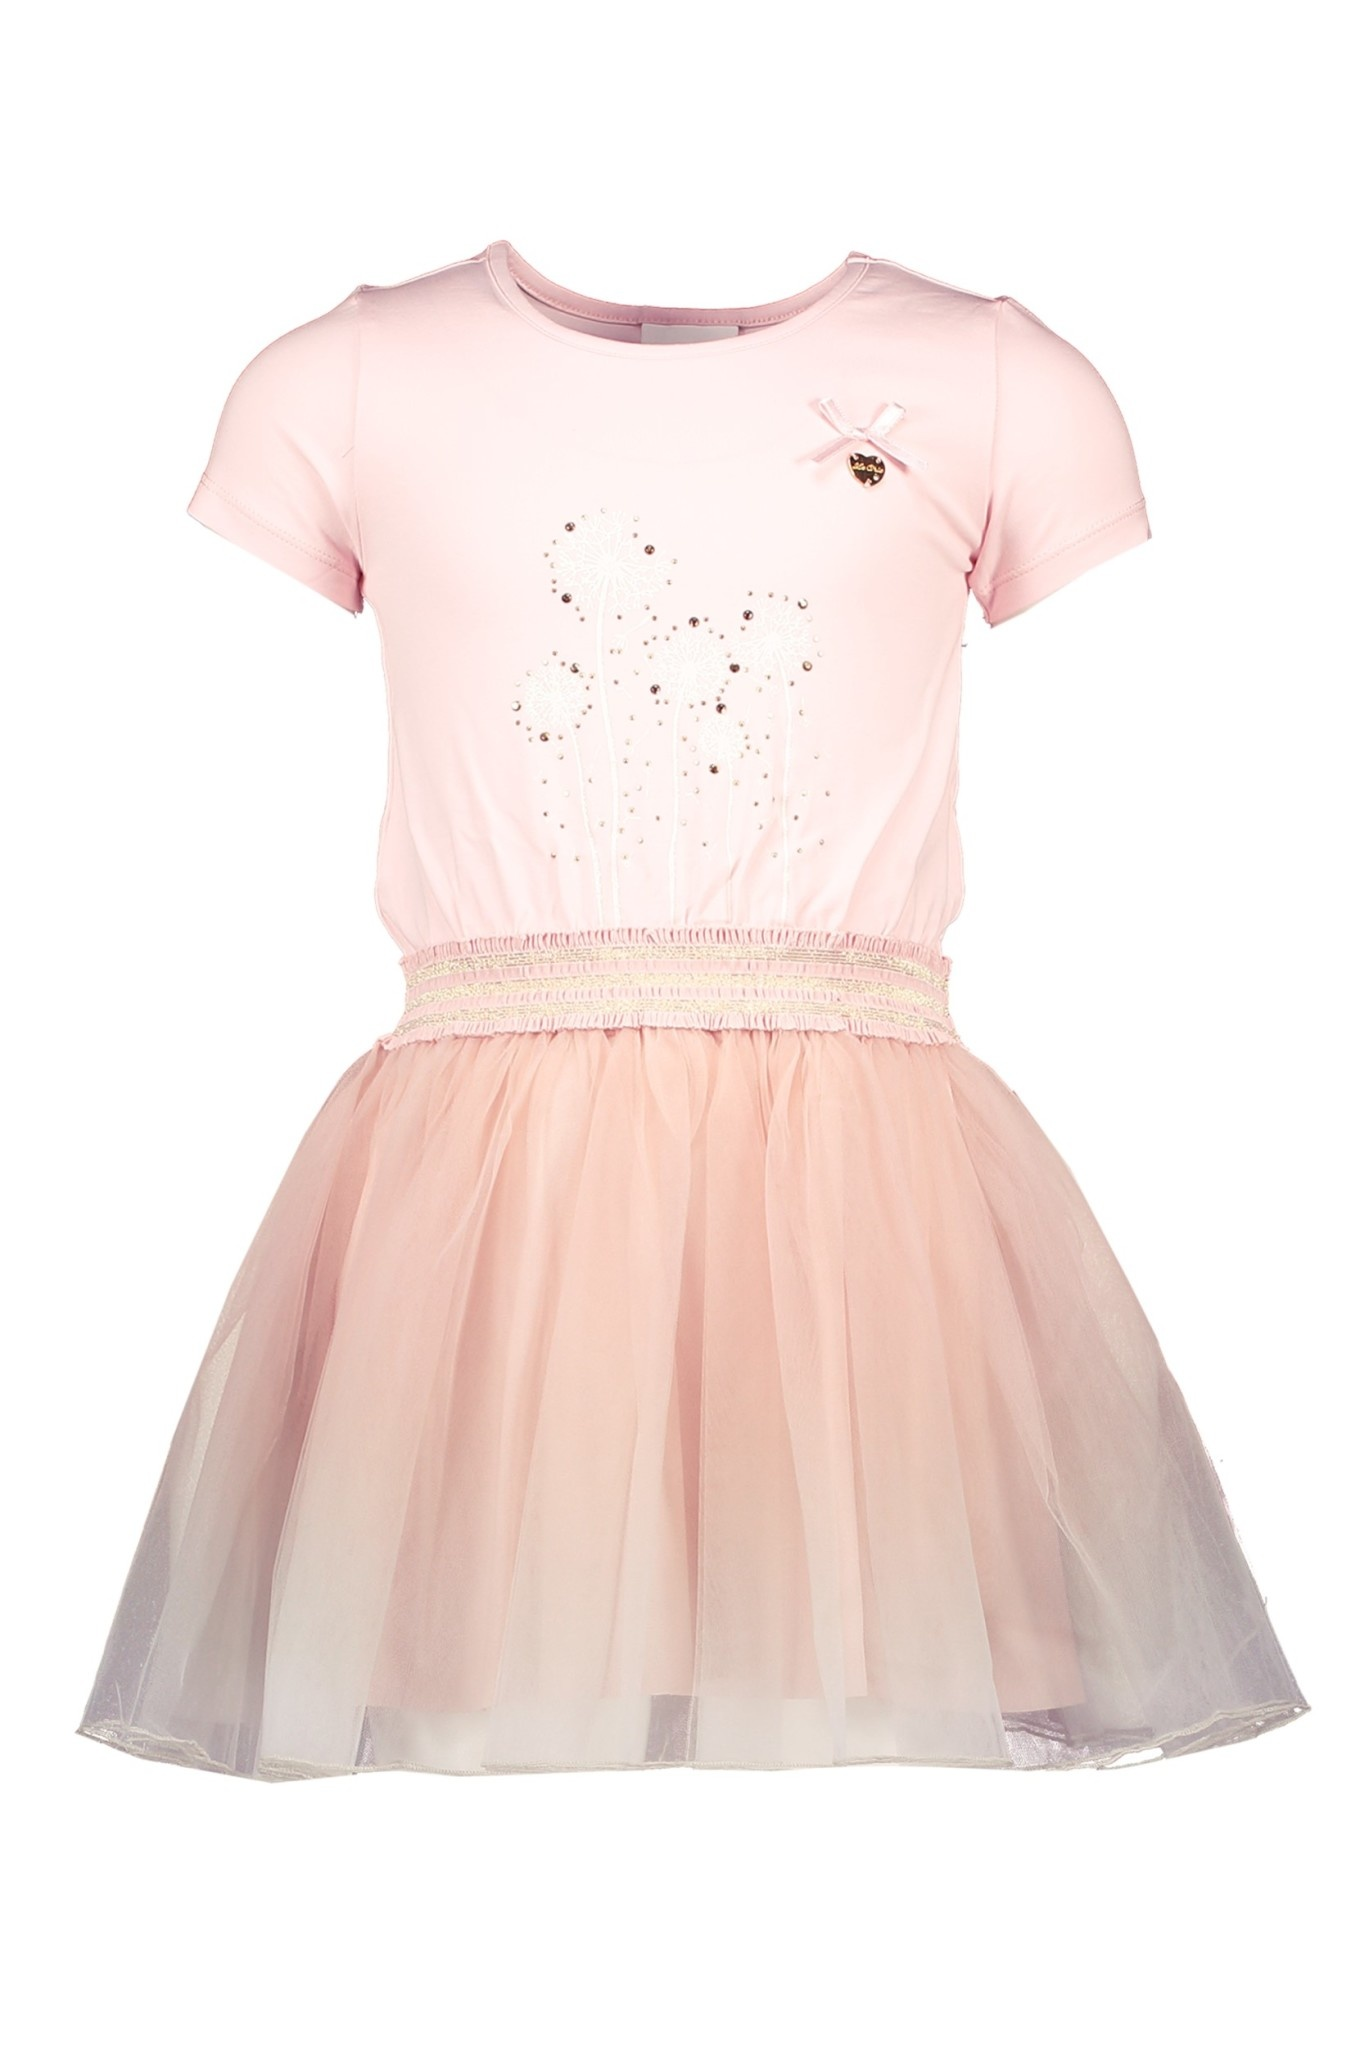 Lechic LeChic Pink Dip Dye Dandelion Tutu Dress